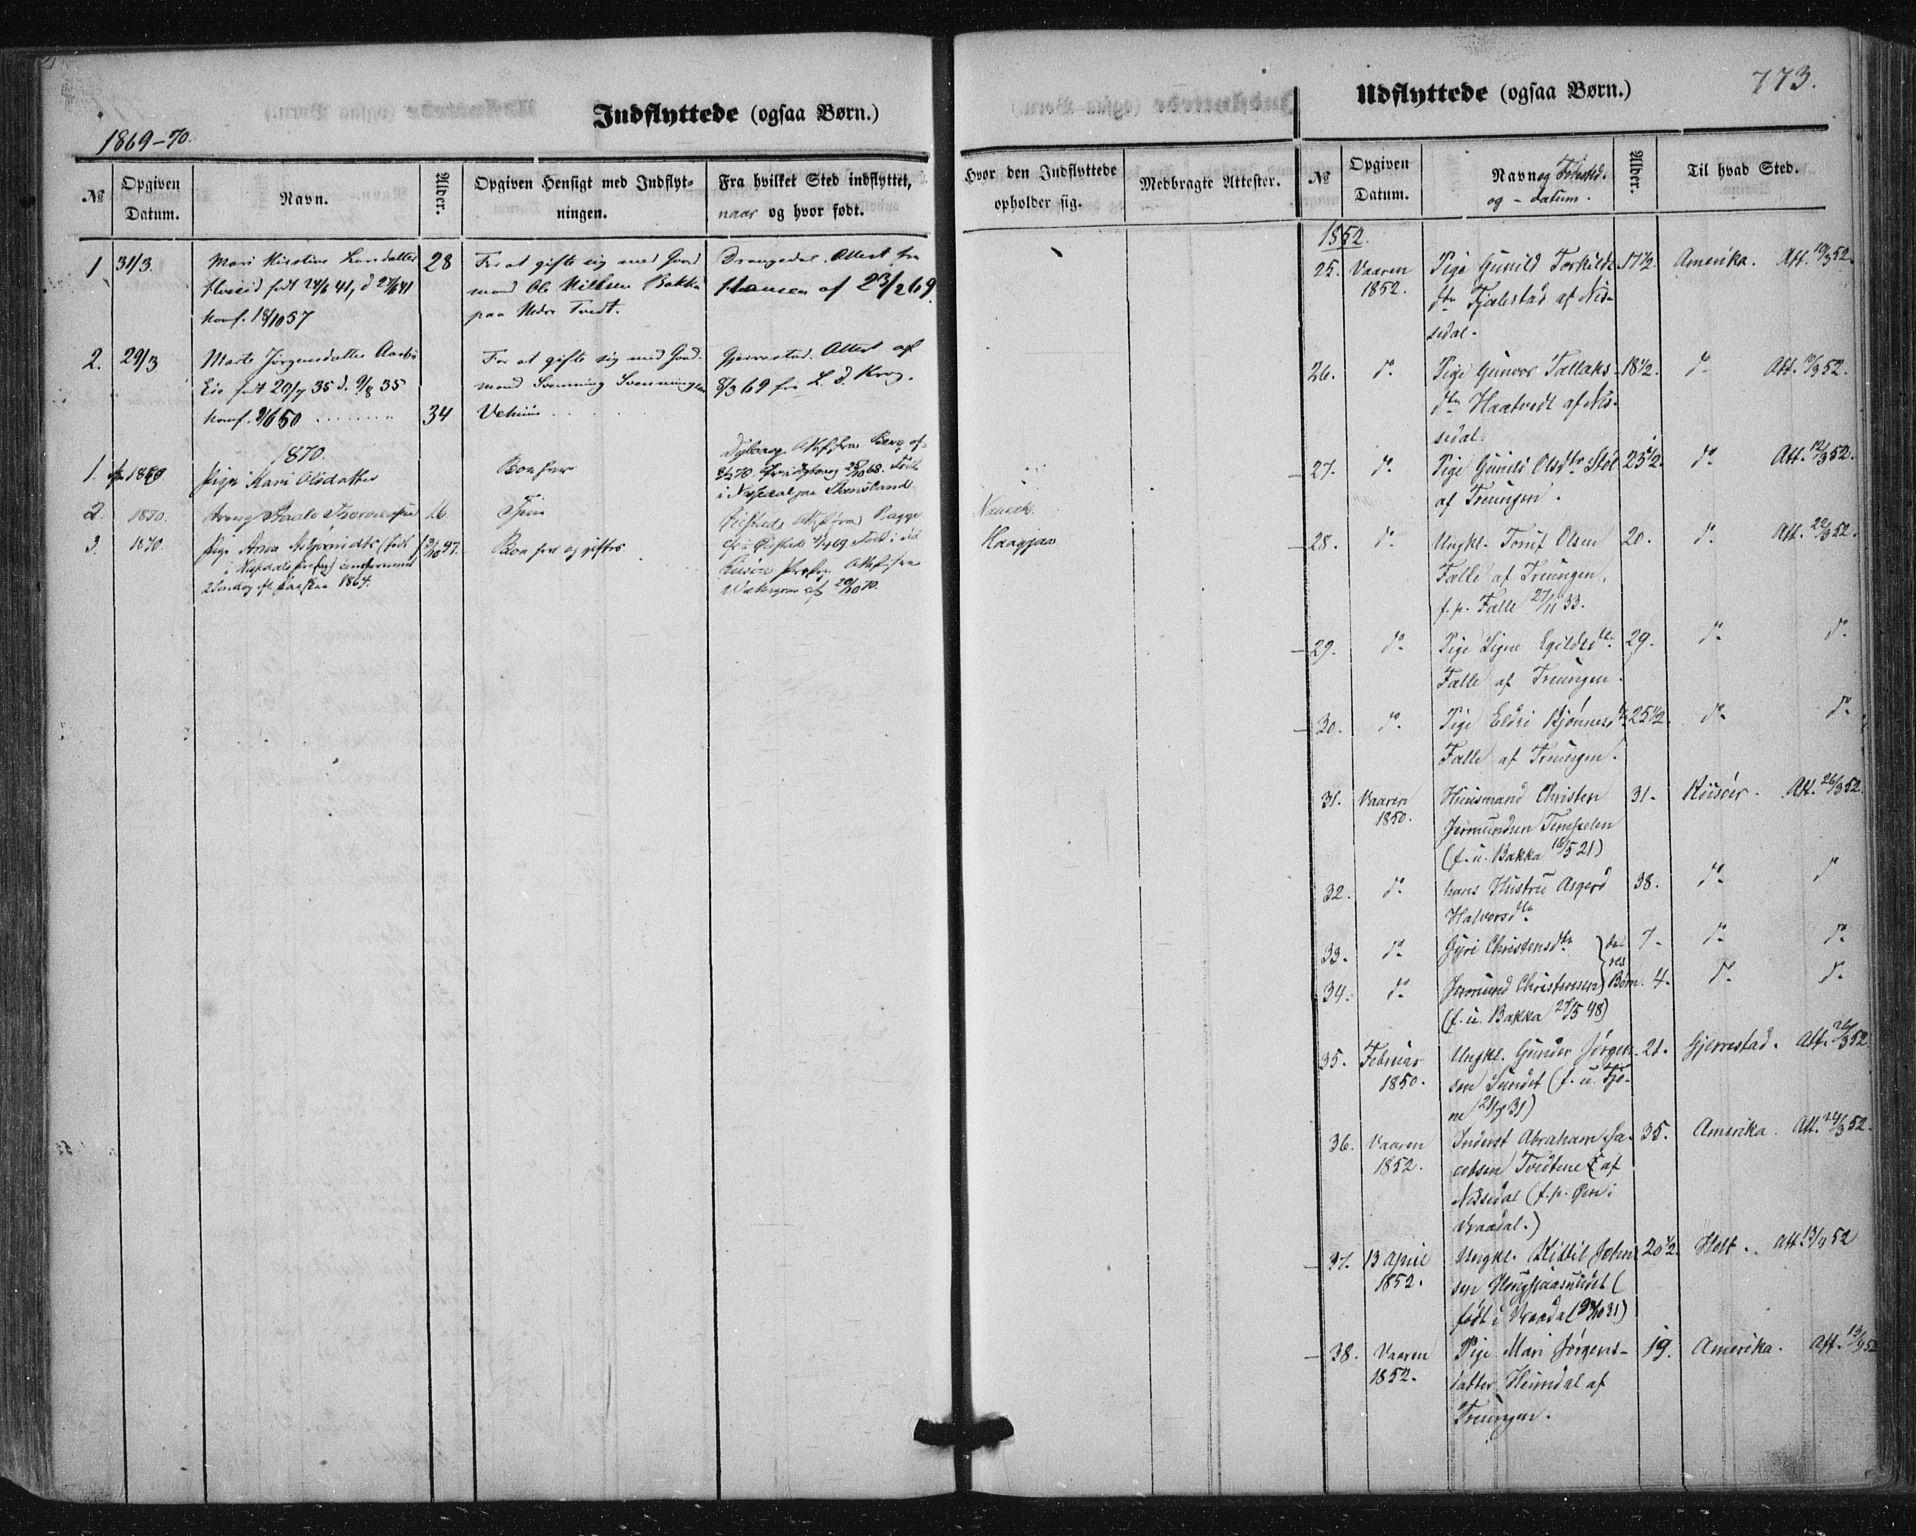 SAKO, Nissedal kirkebøker, F/Fa/L0003: Ministerialbok nr. I 3, 1846-1870, s. 772-773